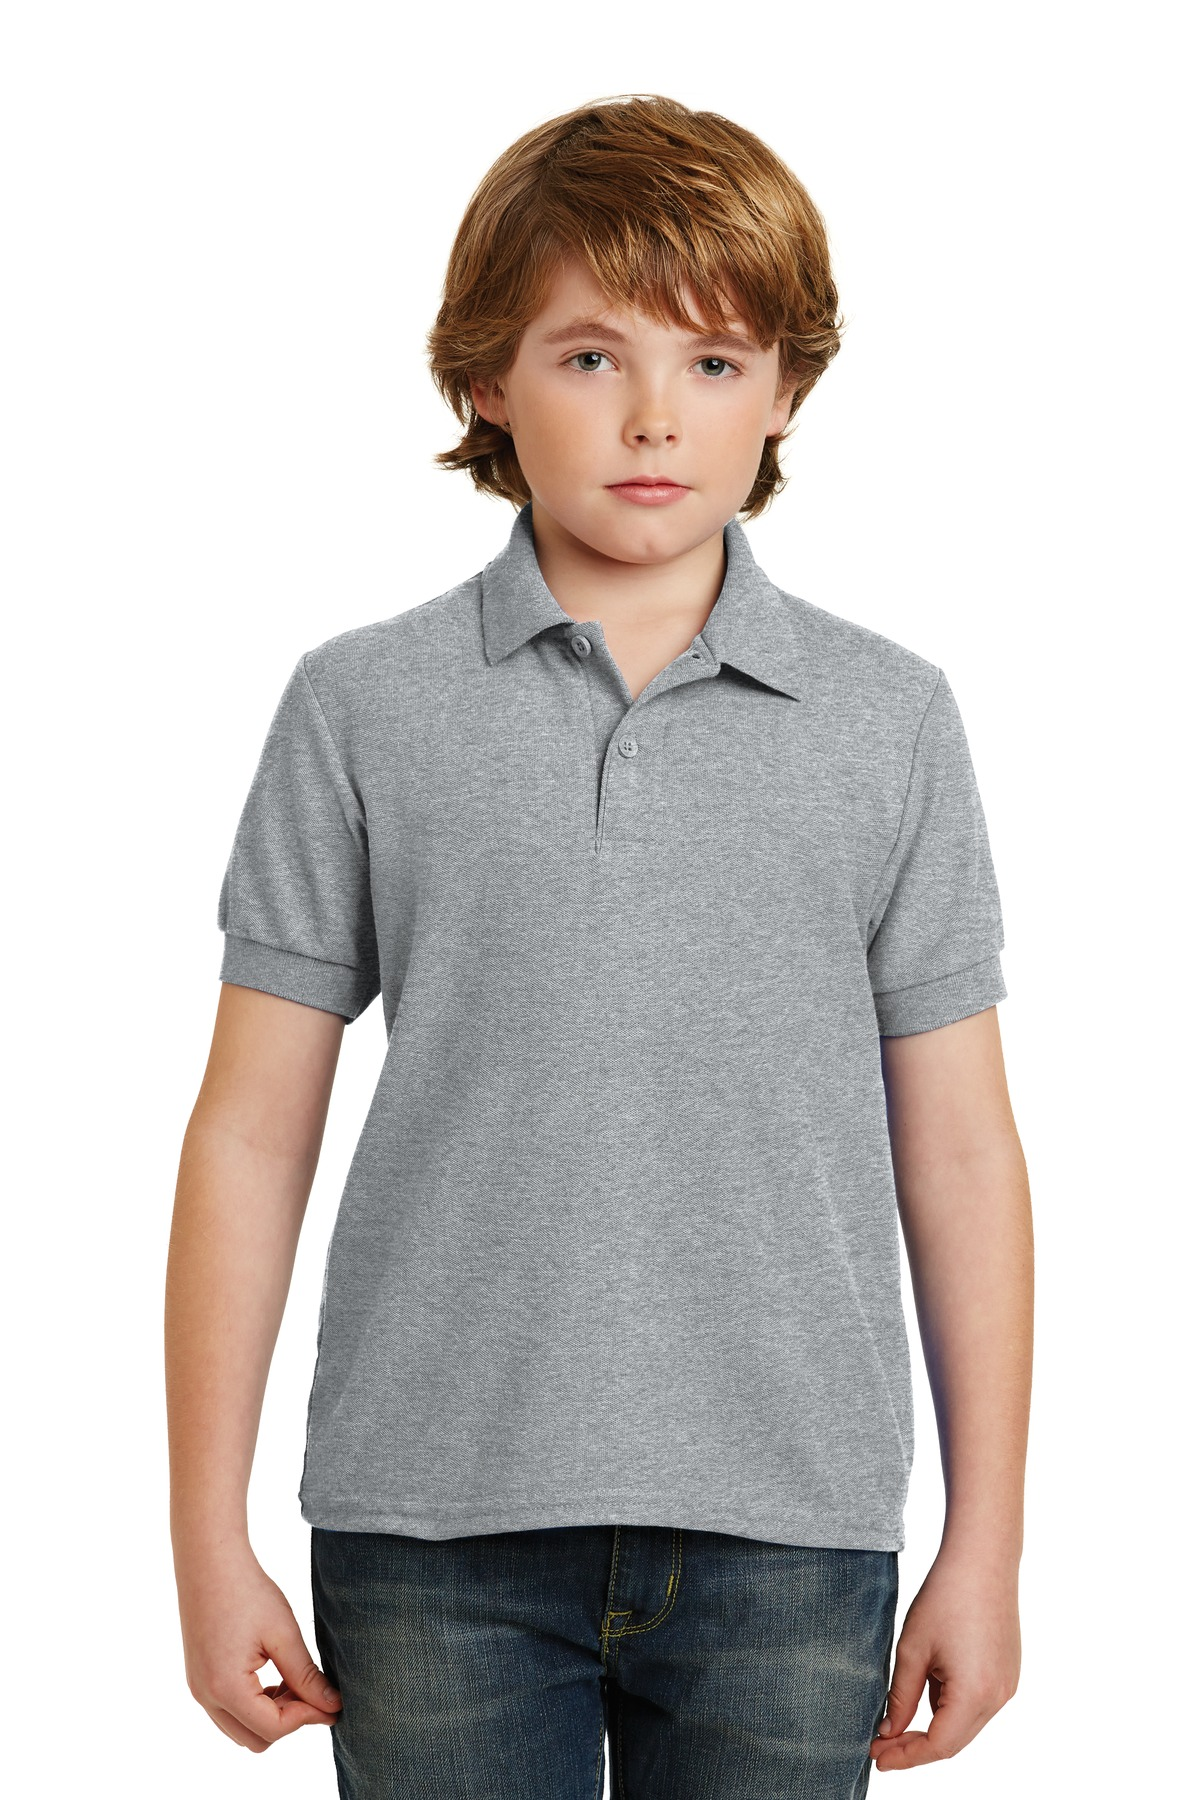 Gildan Youth DryBlend 6-Ounce Double Pique Sport Shirt